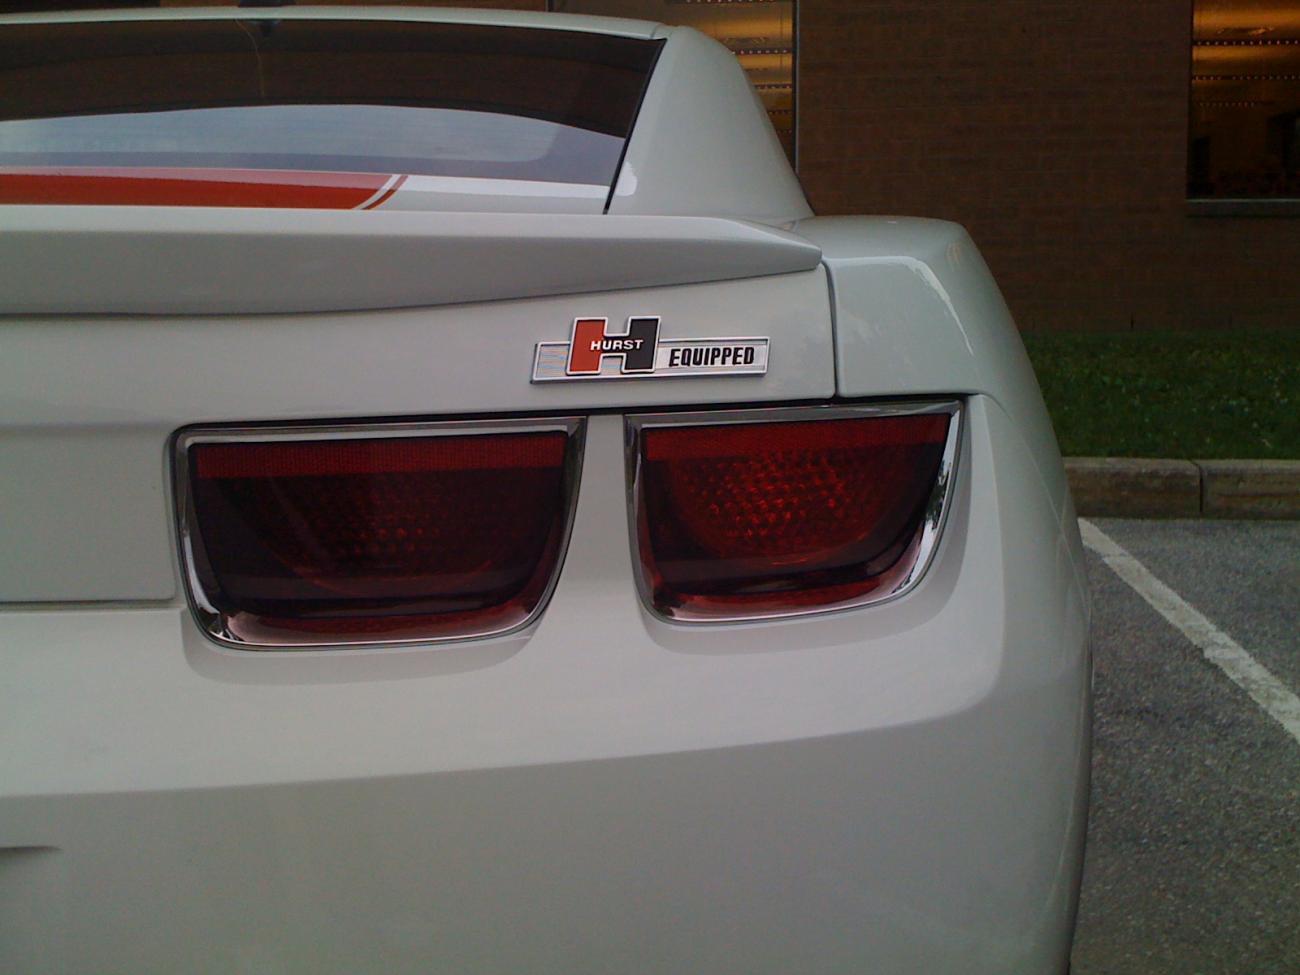 Hurst 1361000 Hurst Equipped Emblem